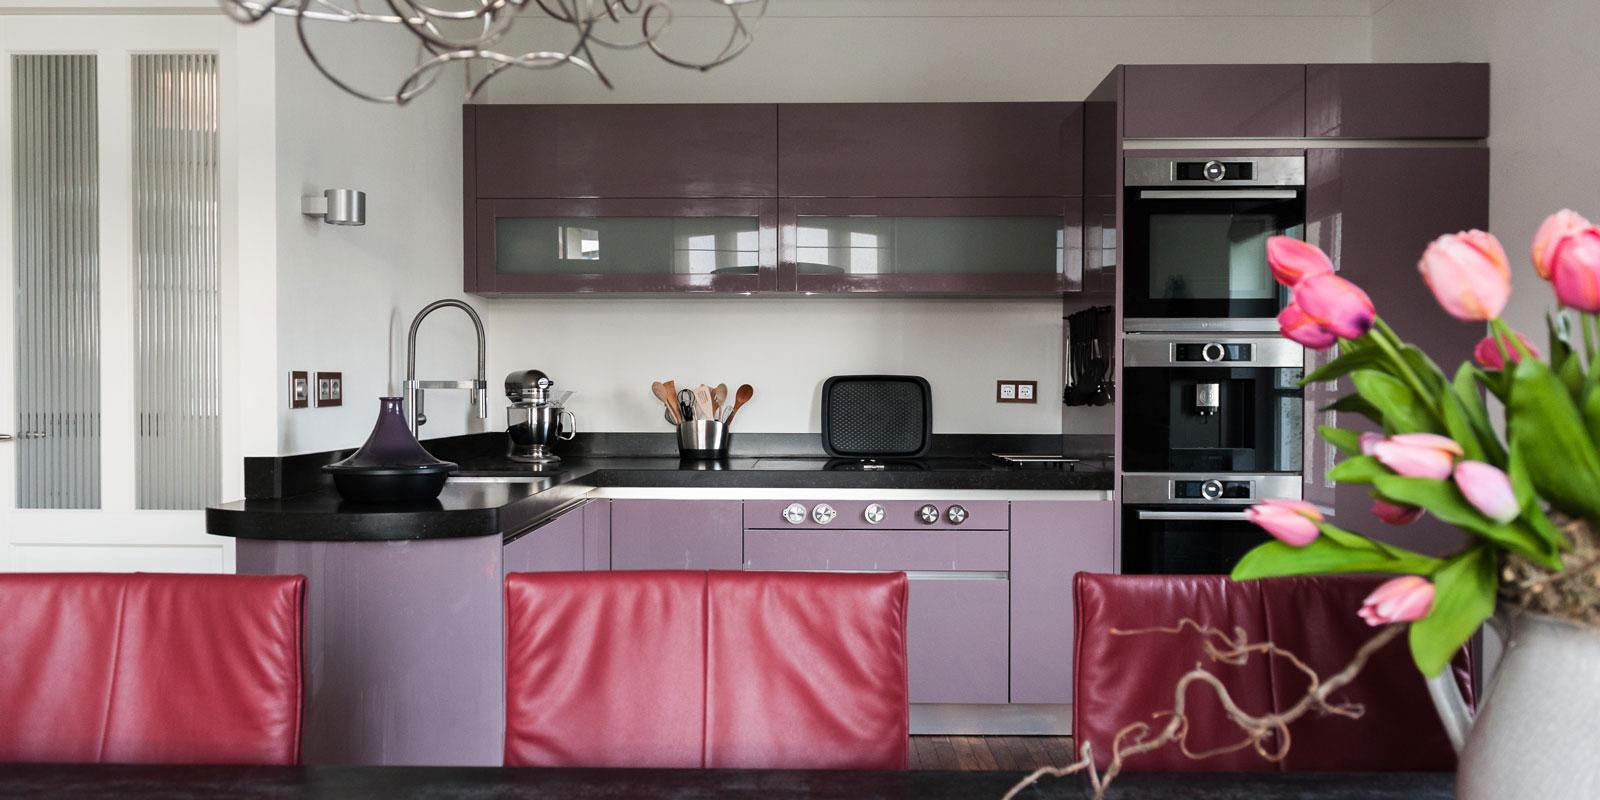 Keuken, Modern klassiek interieur, MarStyling